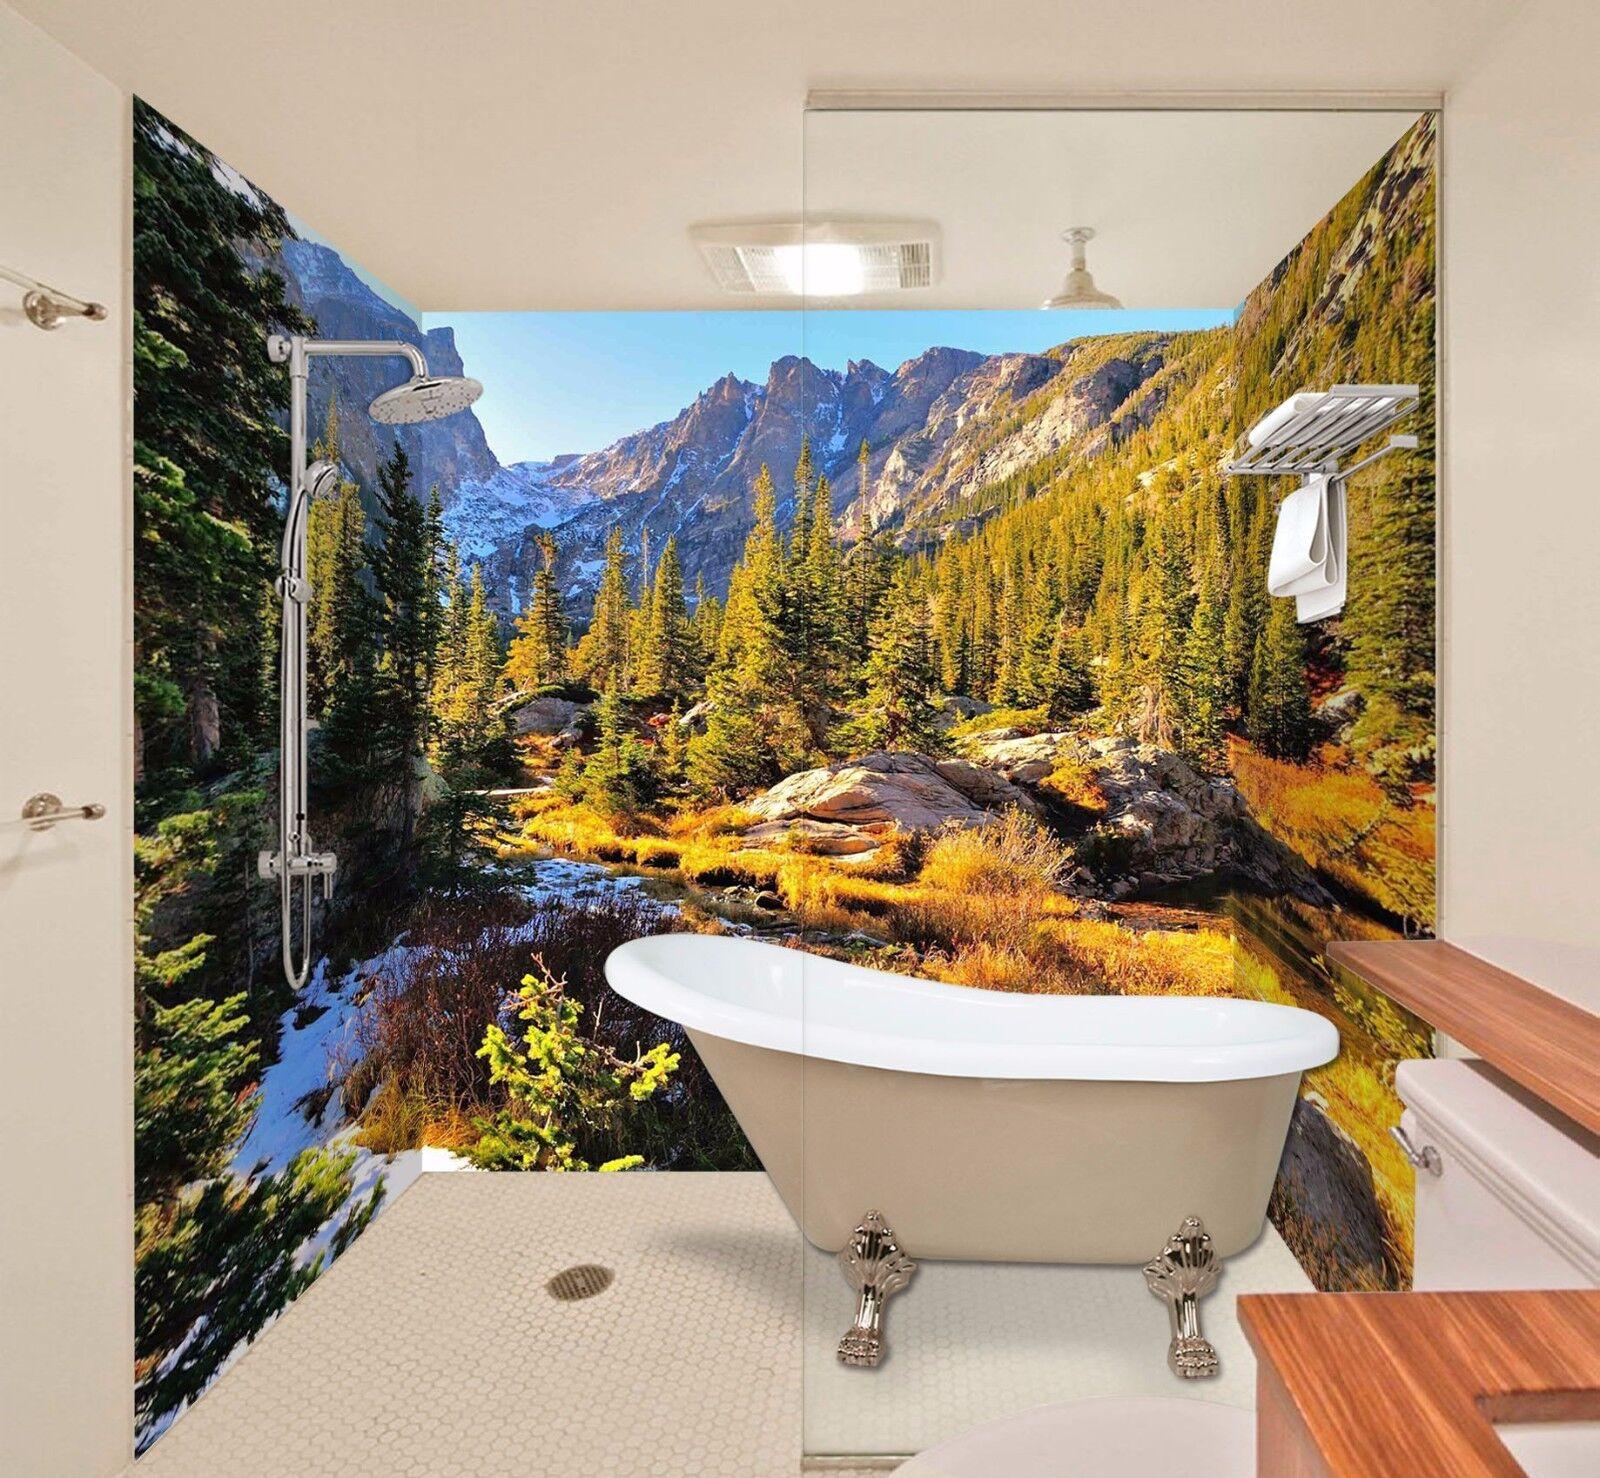 3D Mountain Sky 554 WallPaper Bathroom Print Decal Wall Deco AJ WALLPAPER AU